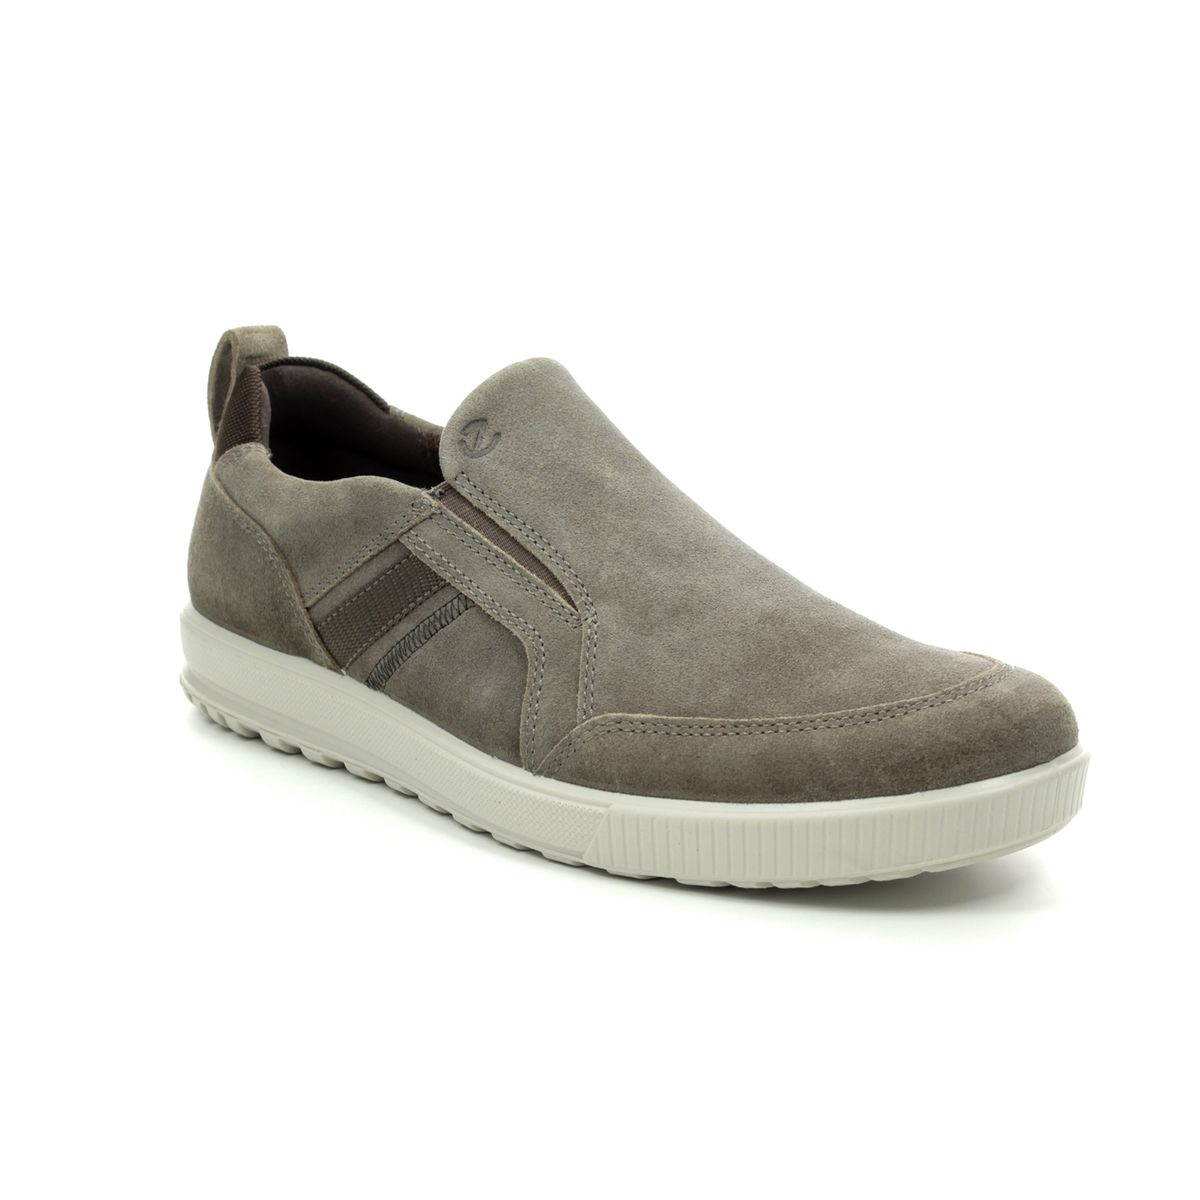 a1ba953e60b3 ECCO Casual Shoes - Taupe suede - 534364 02192 ENNIO SLIP